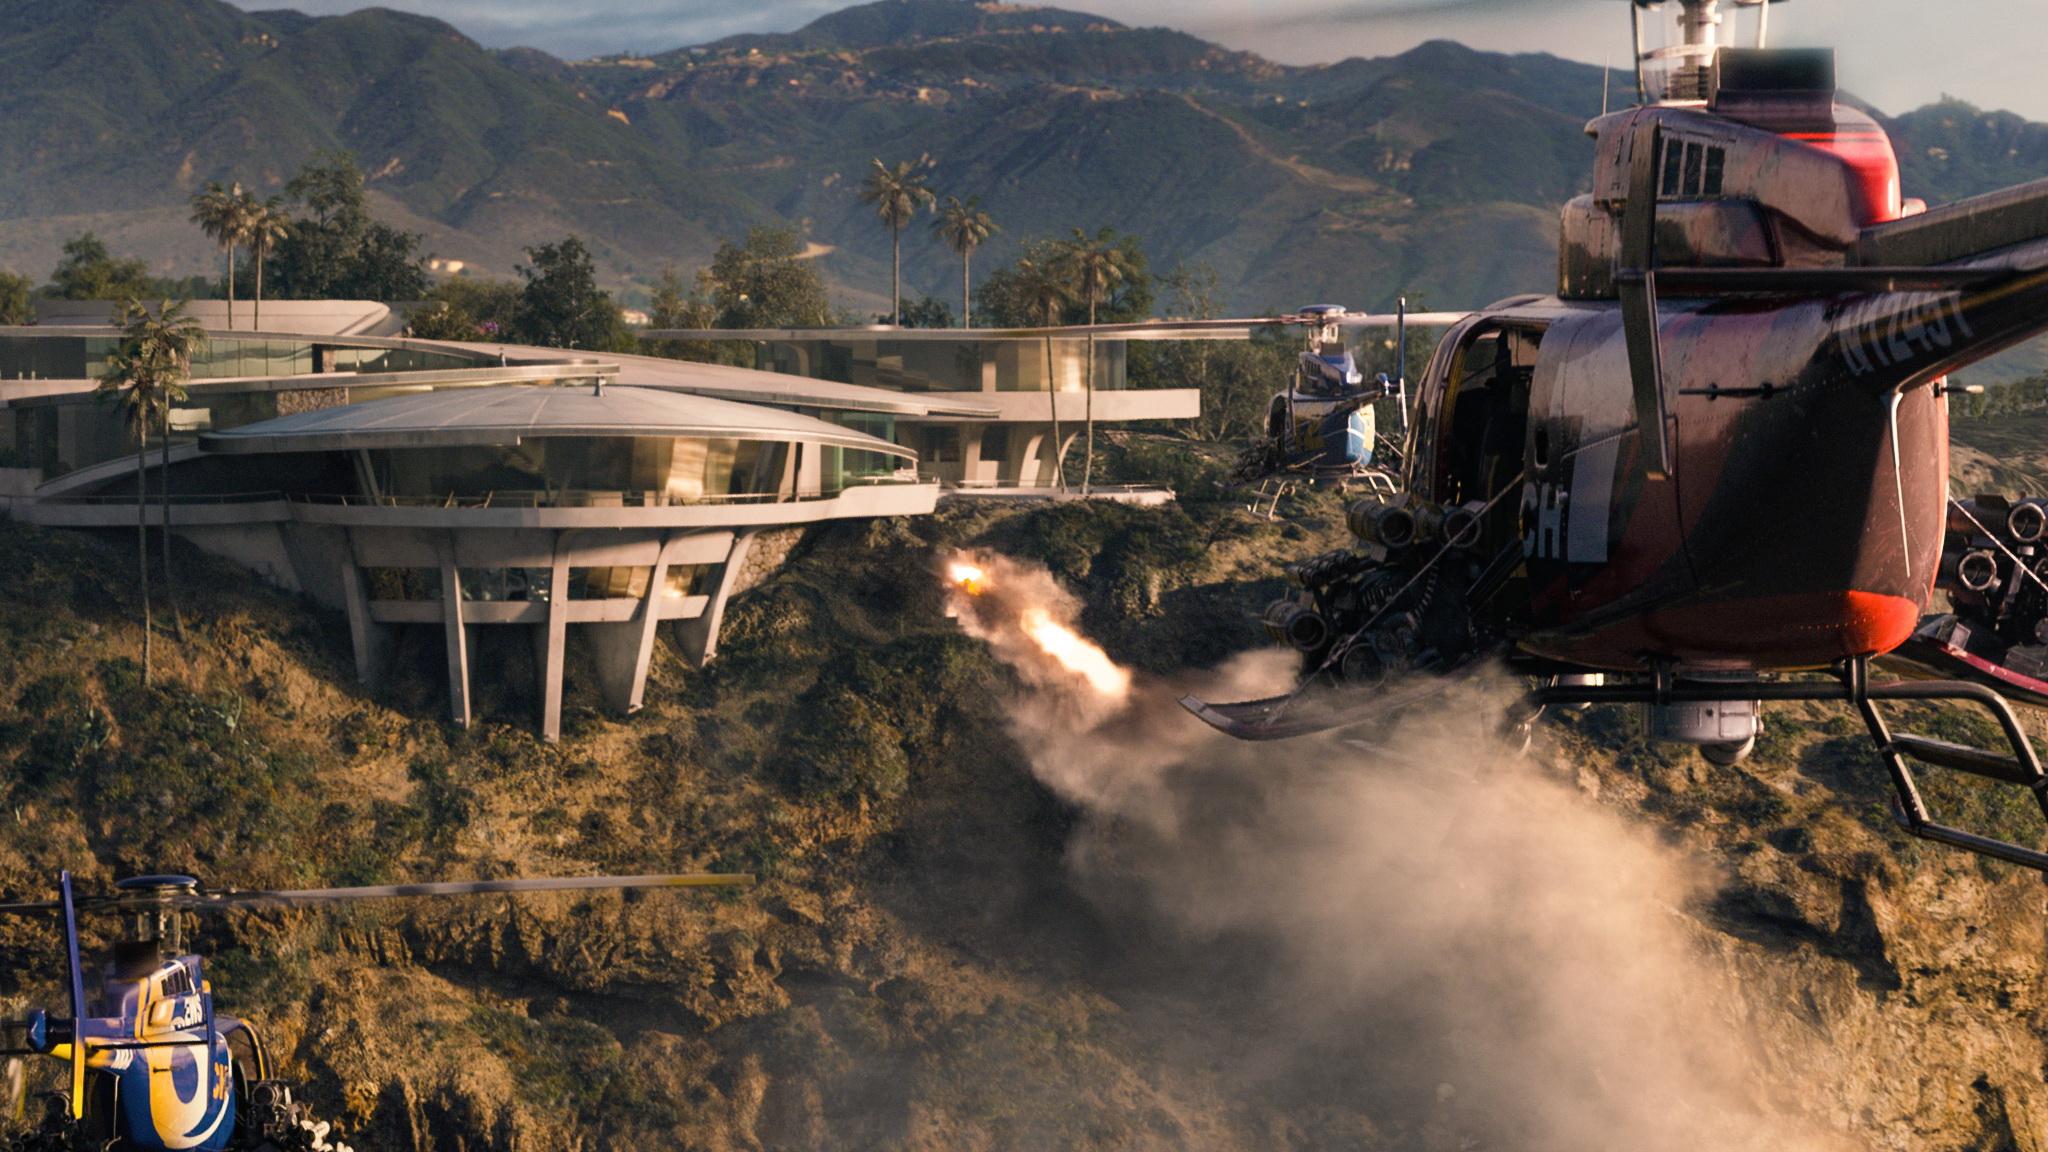 Tony Stark's Mansion